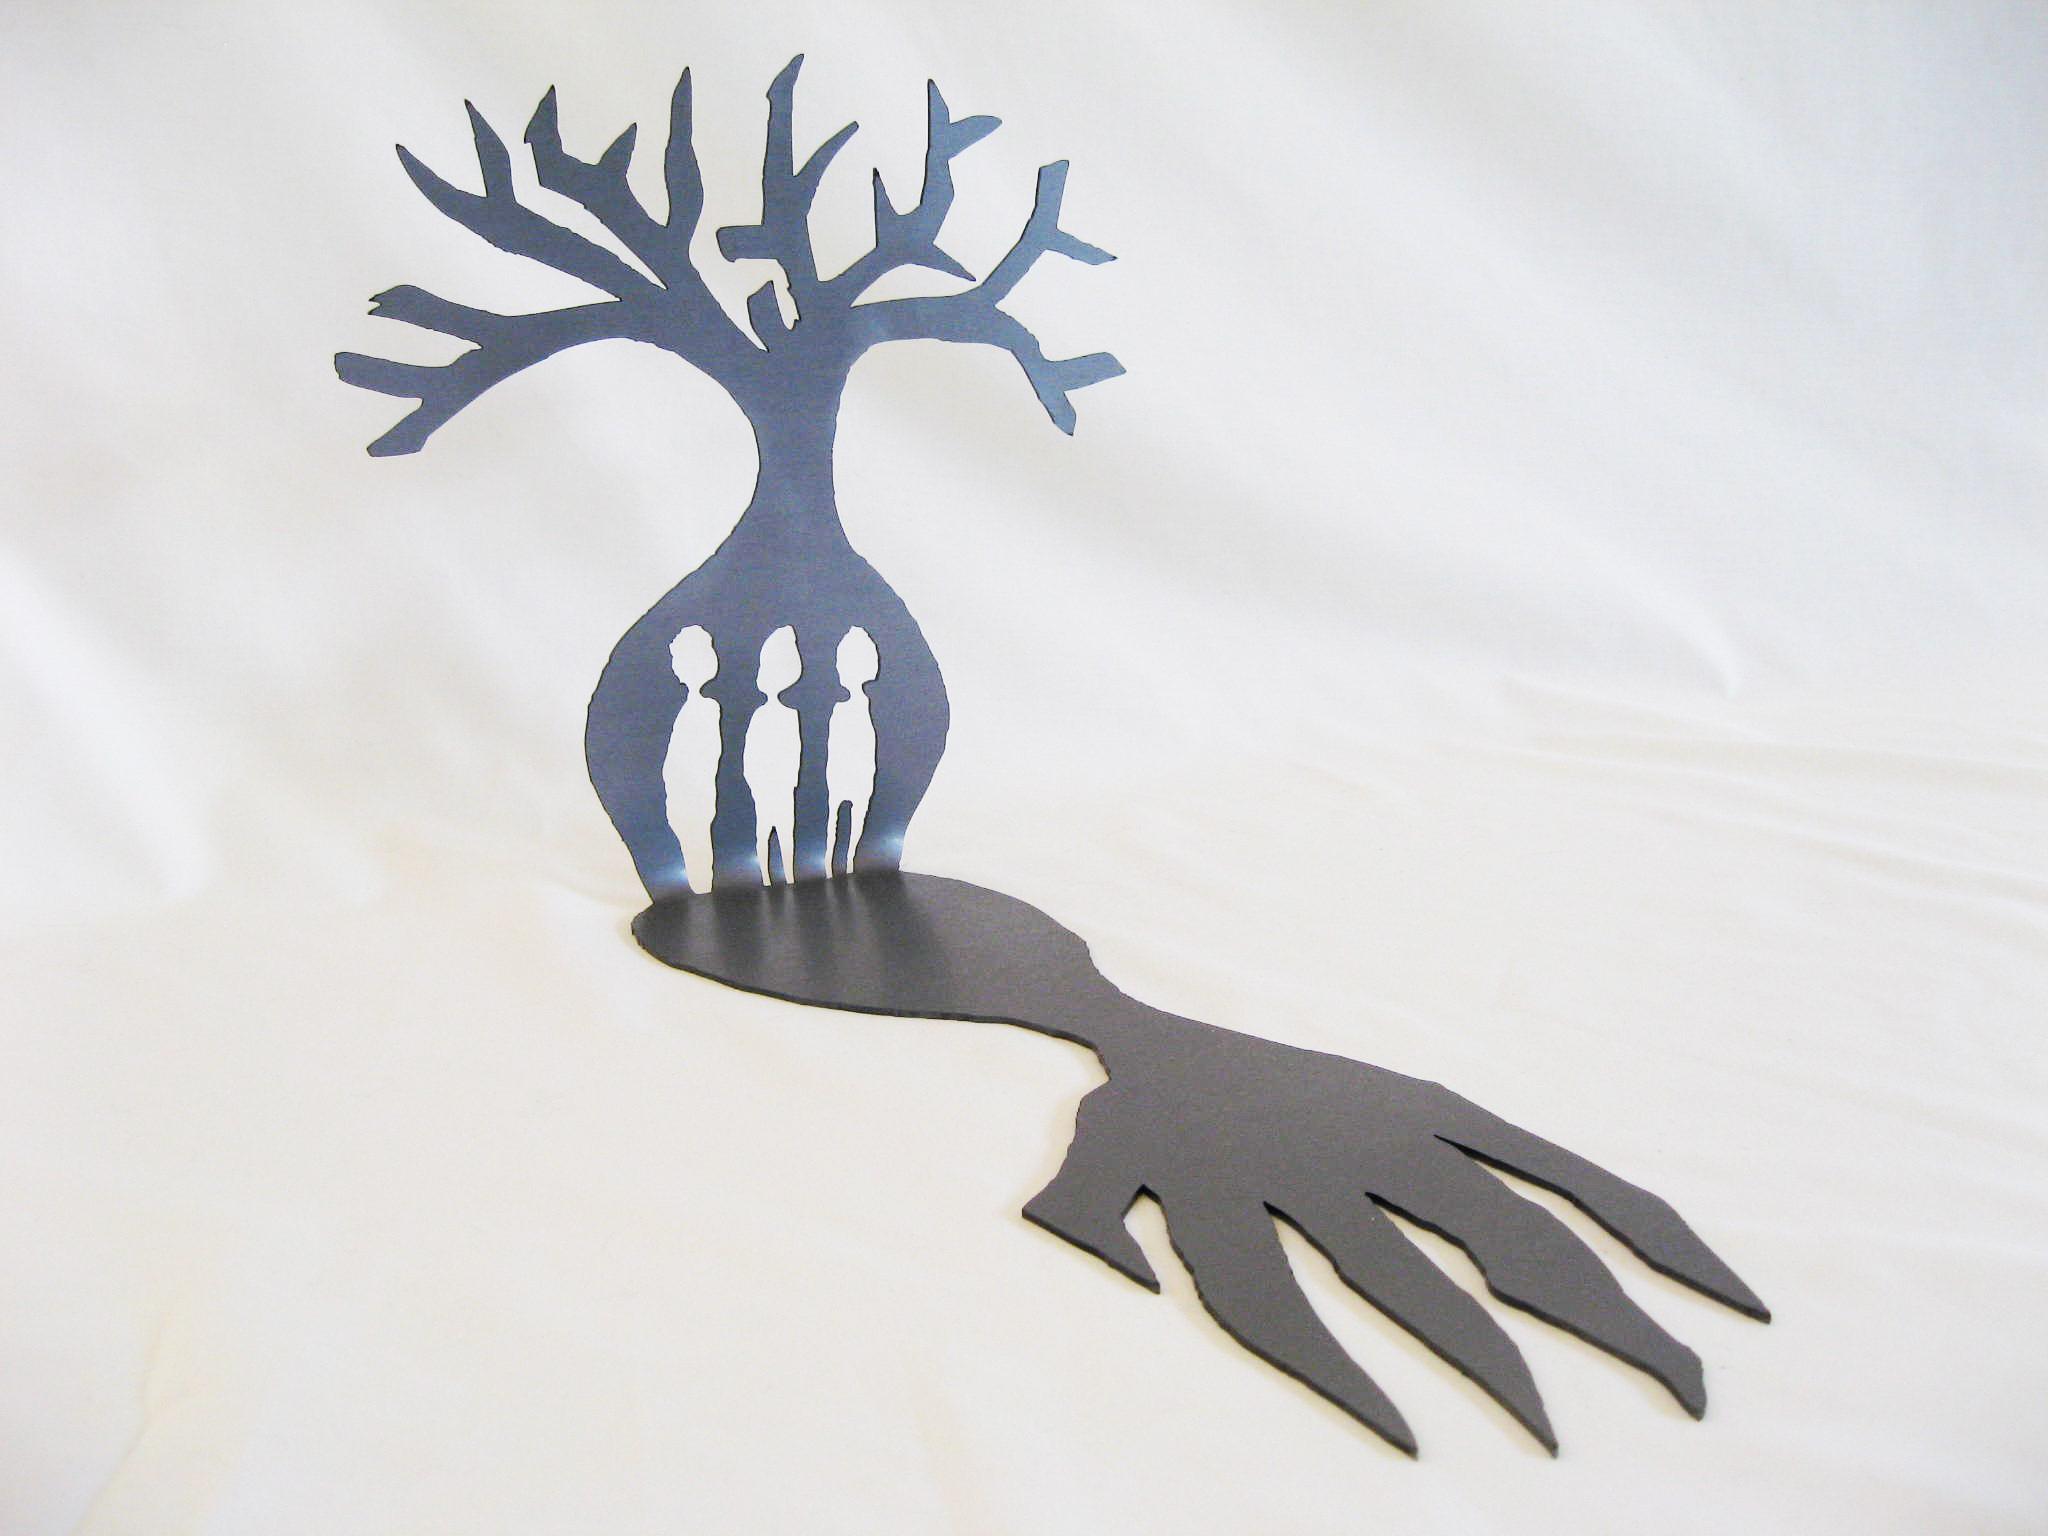 Hand of Truth  (2012). Mild Steel. 45cm x 25cm x 25 cm. Edition of 5.